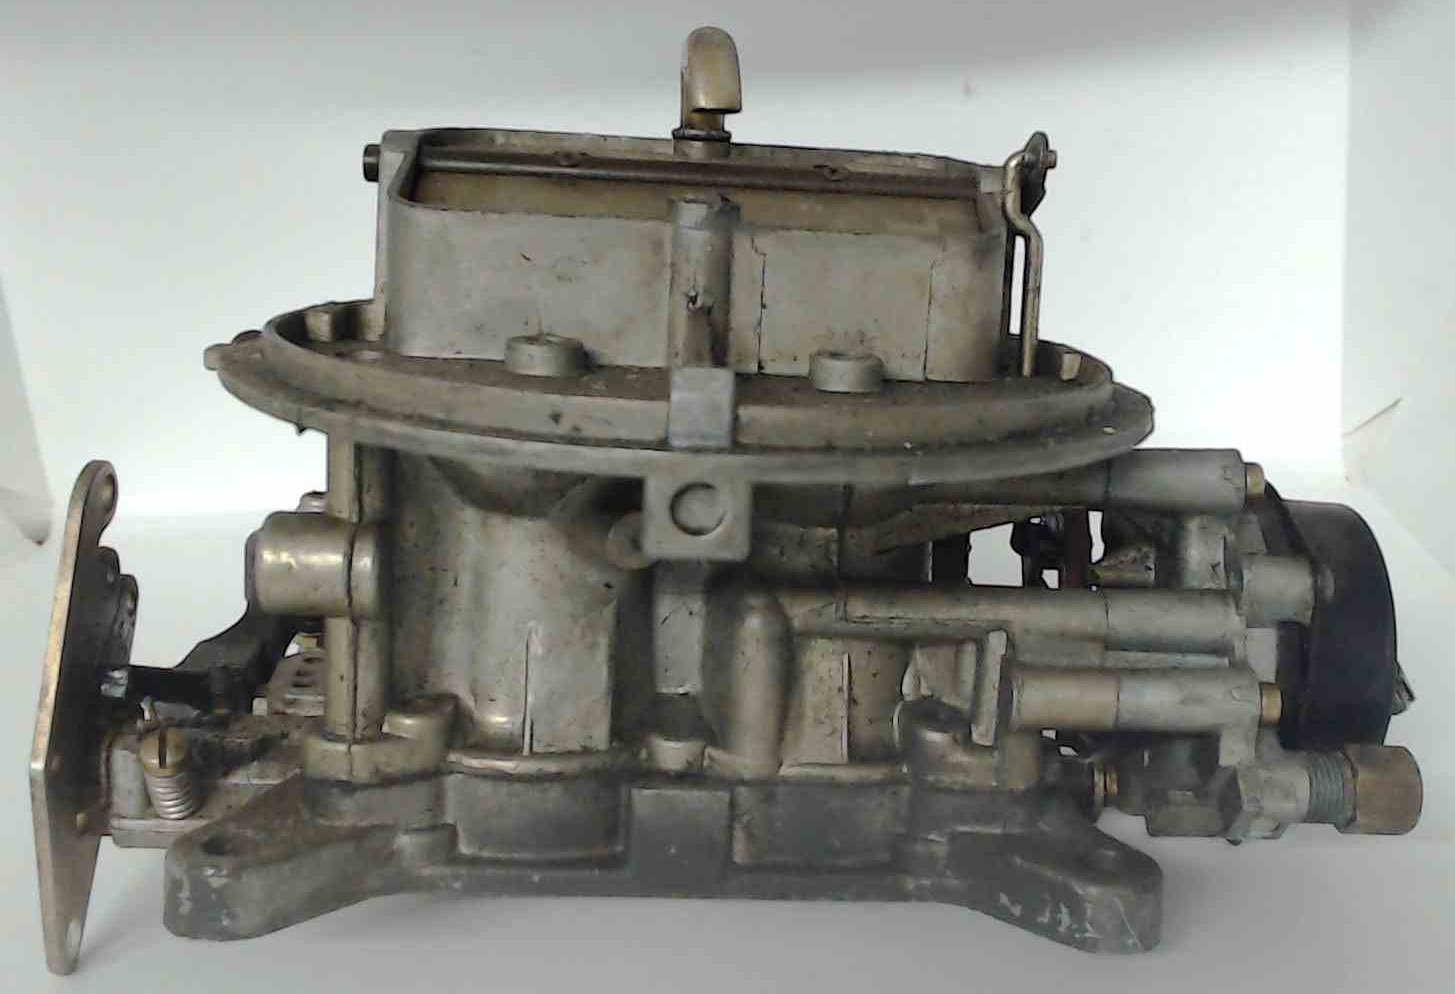 986510 80321 2629 Holley 2 Barrel Carburetor for OMC 3 0L FOR PARTS/REPAIR!